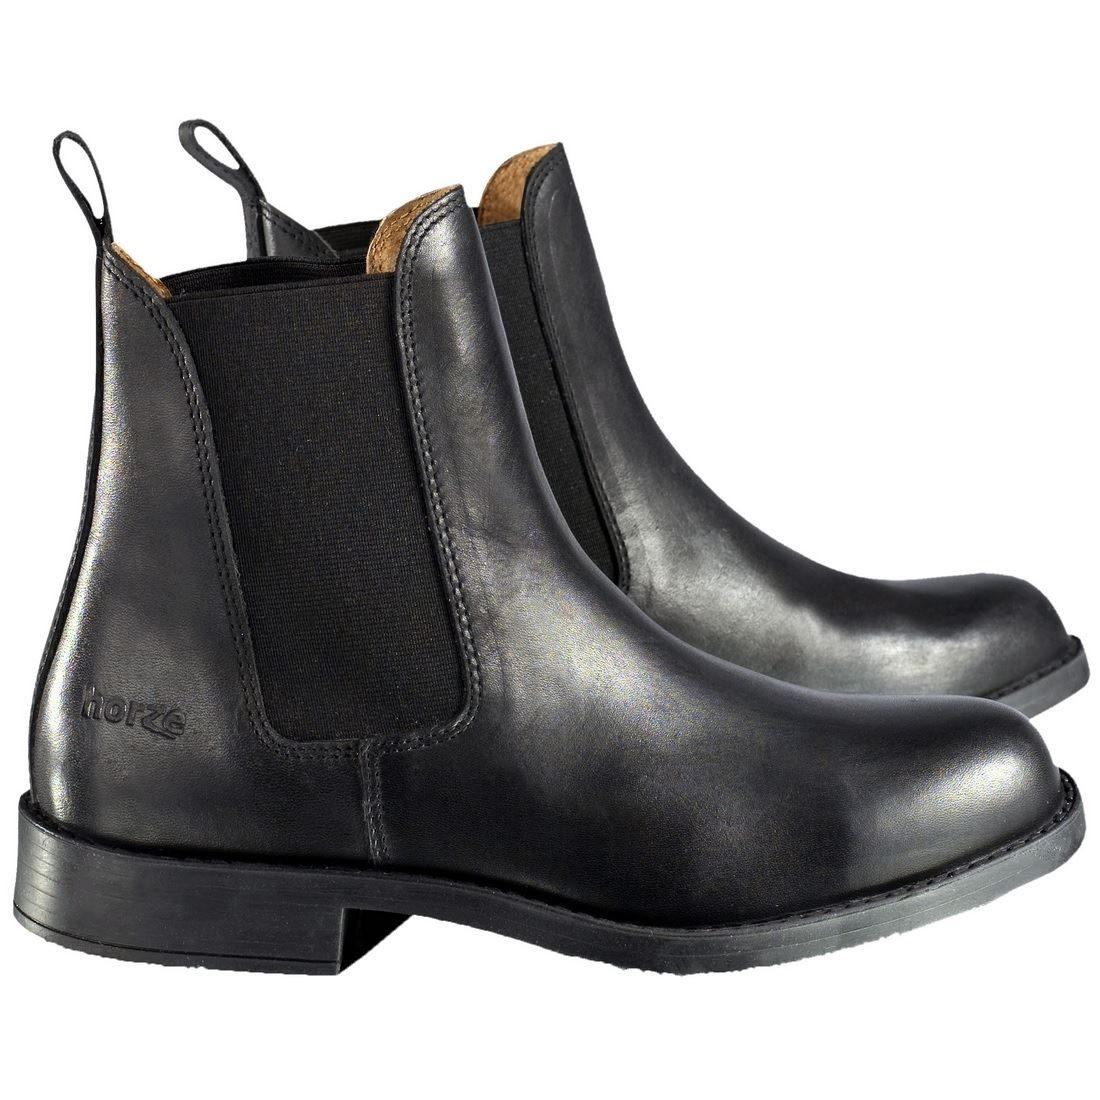 Classic Leather Jodhpur Boots